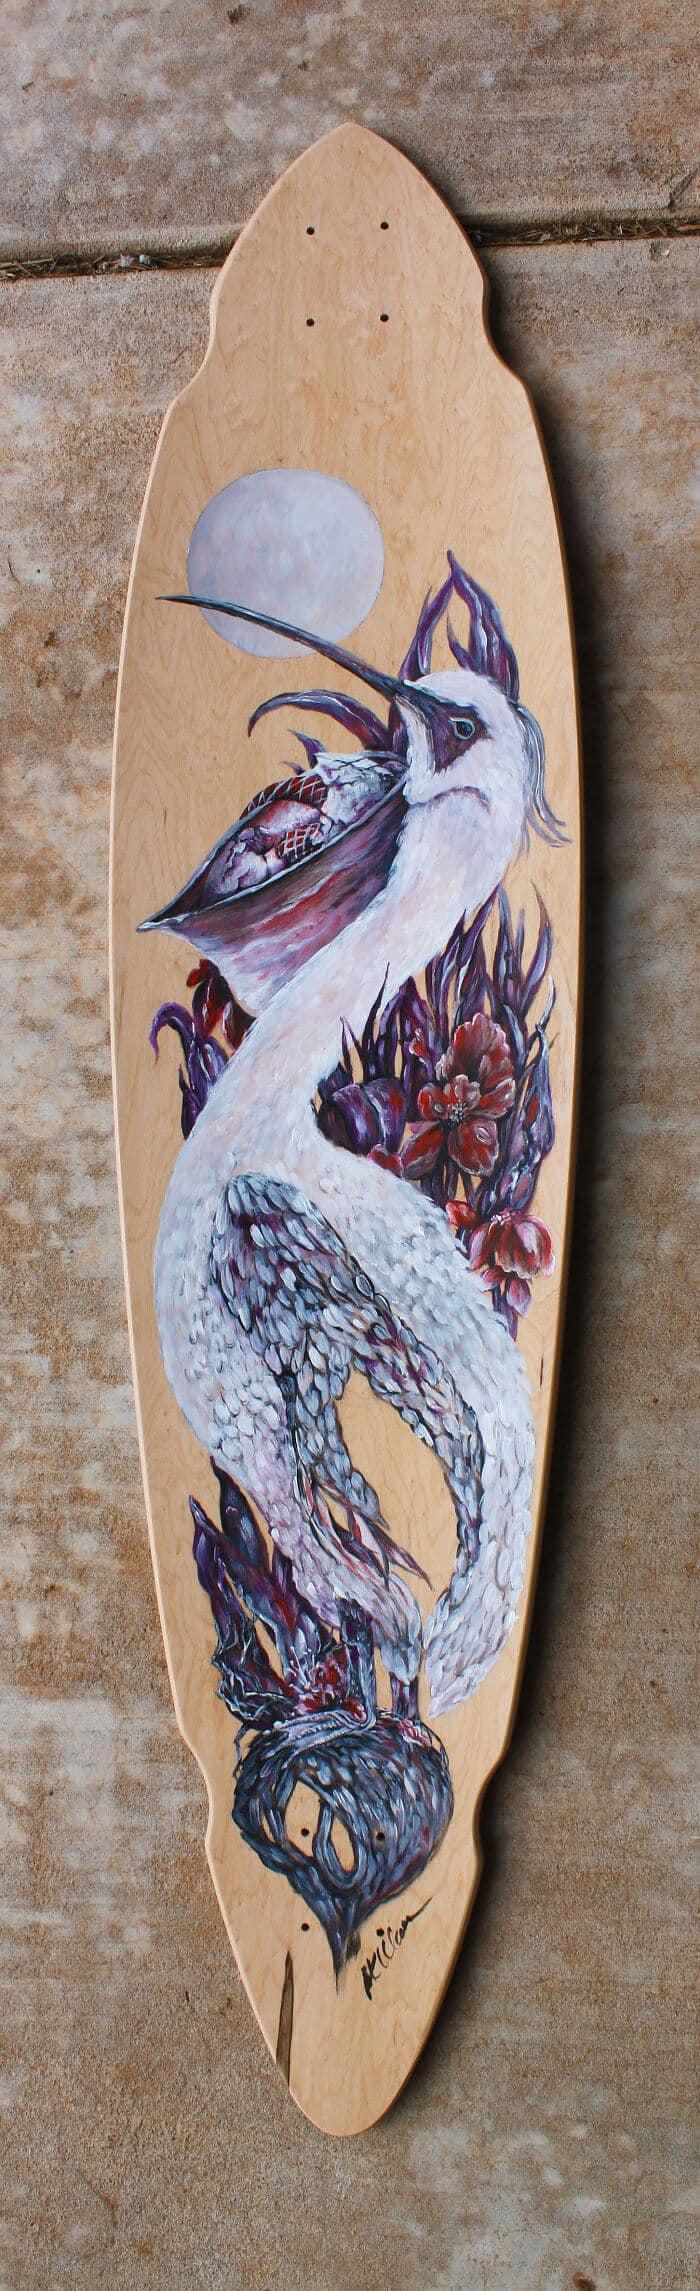 Искусство на скейтборде, рисунок 9